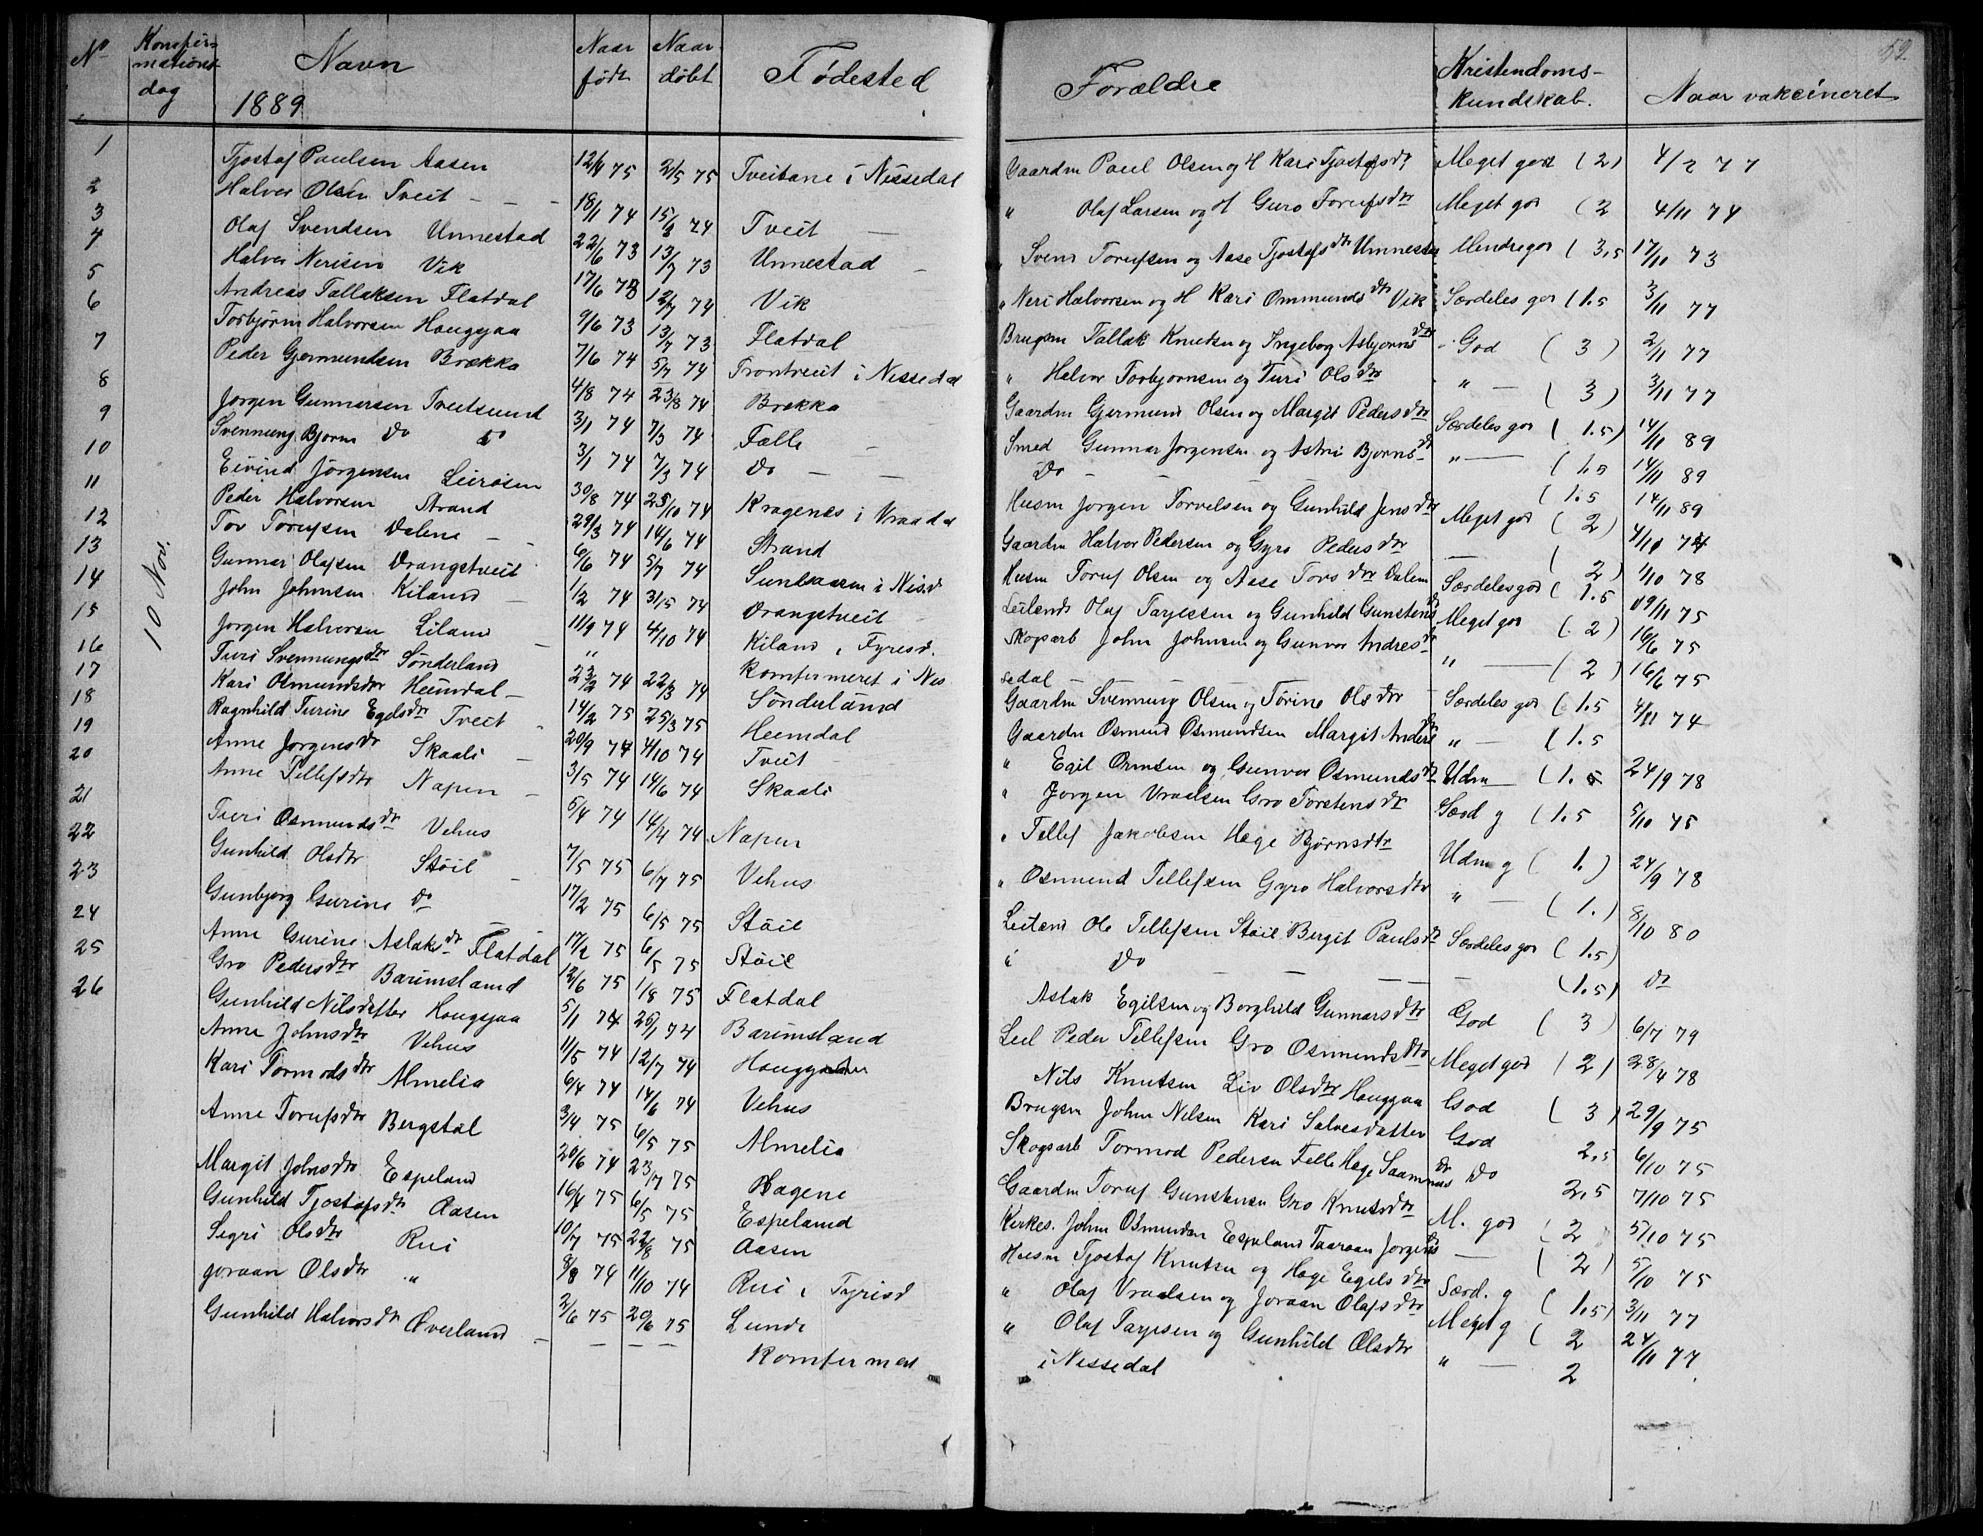 SAKO, Nissedal kirkebøker, G/Gb/L0002: Klokkerbok nr. II 2, 1863-1892, s. 52